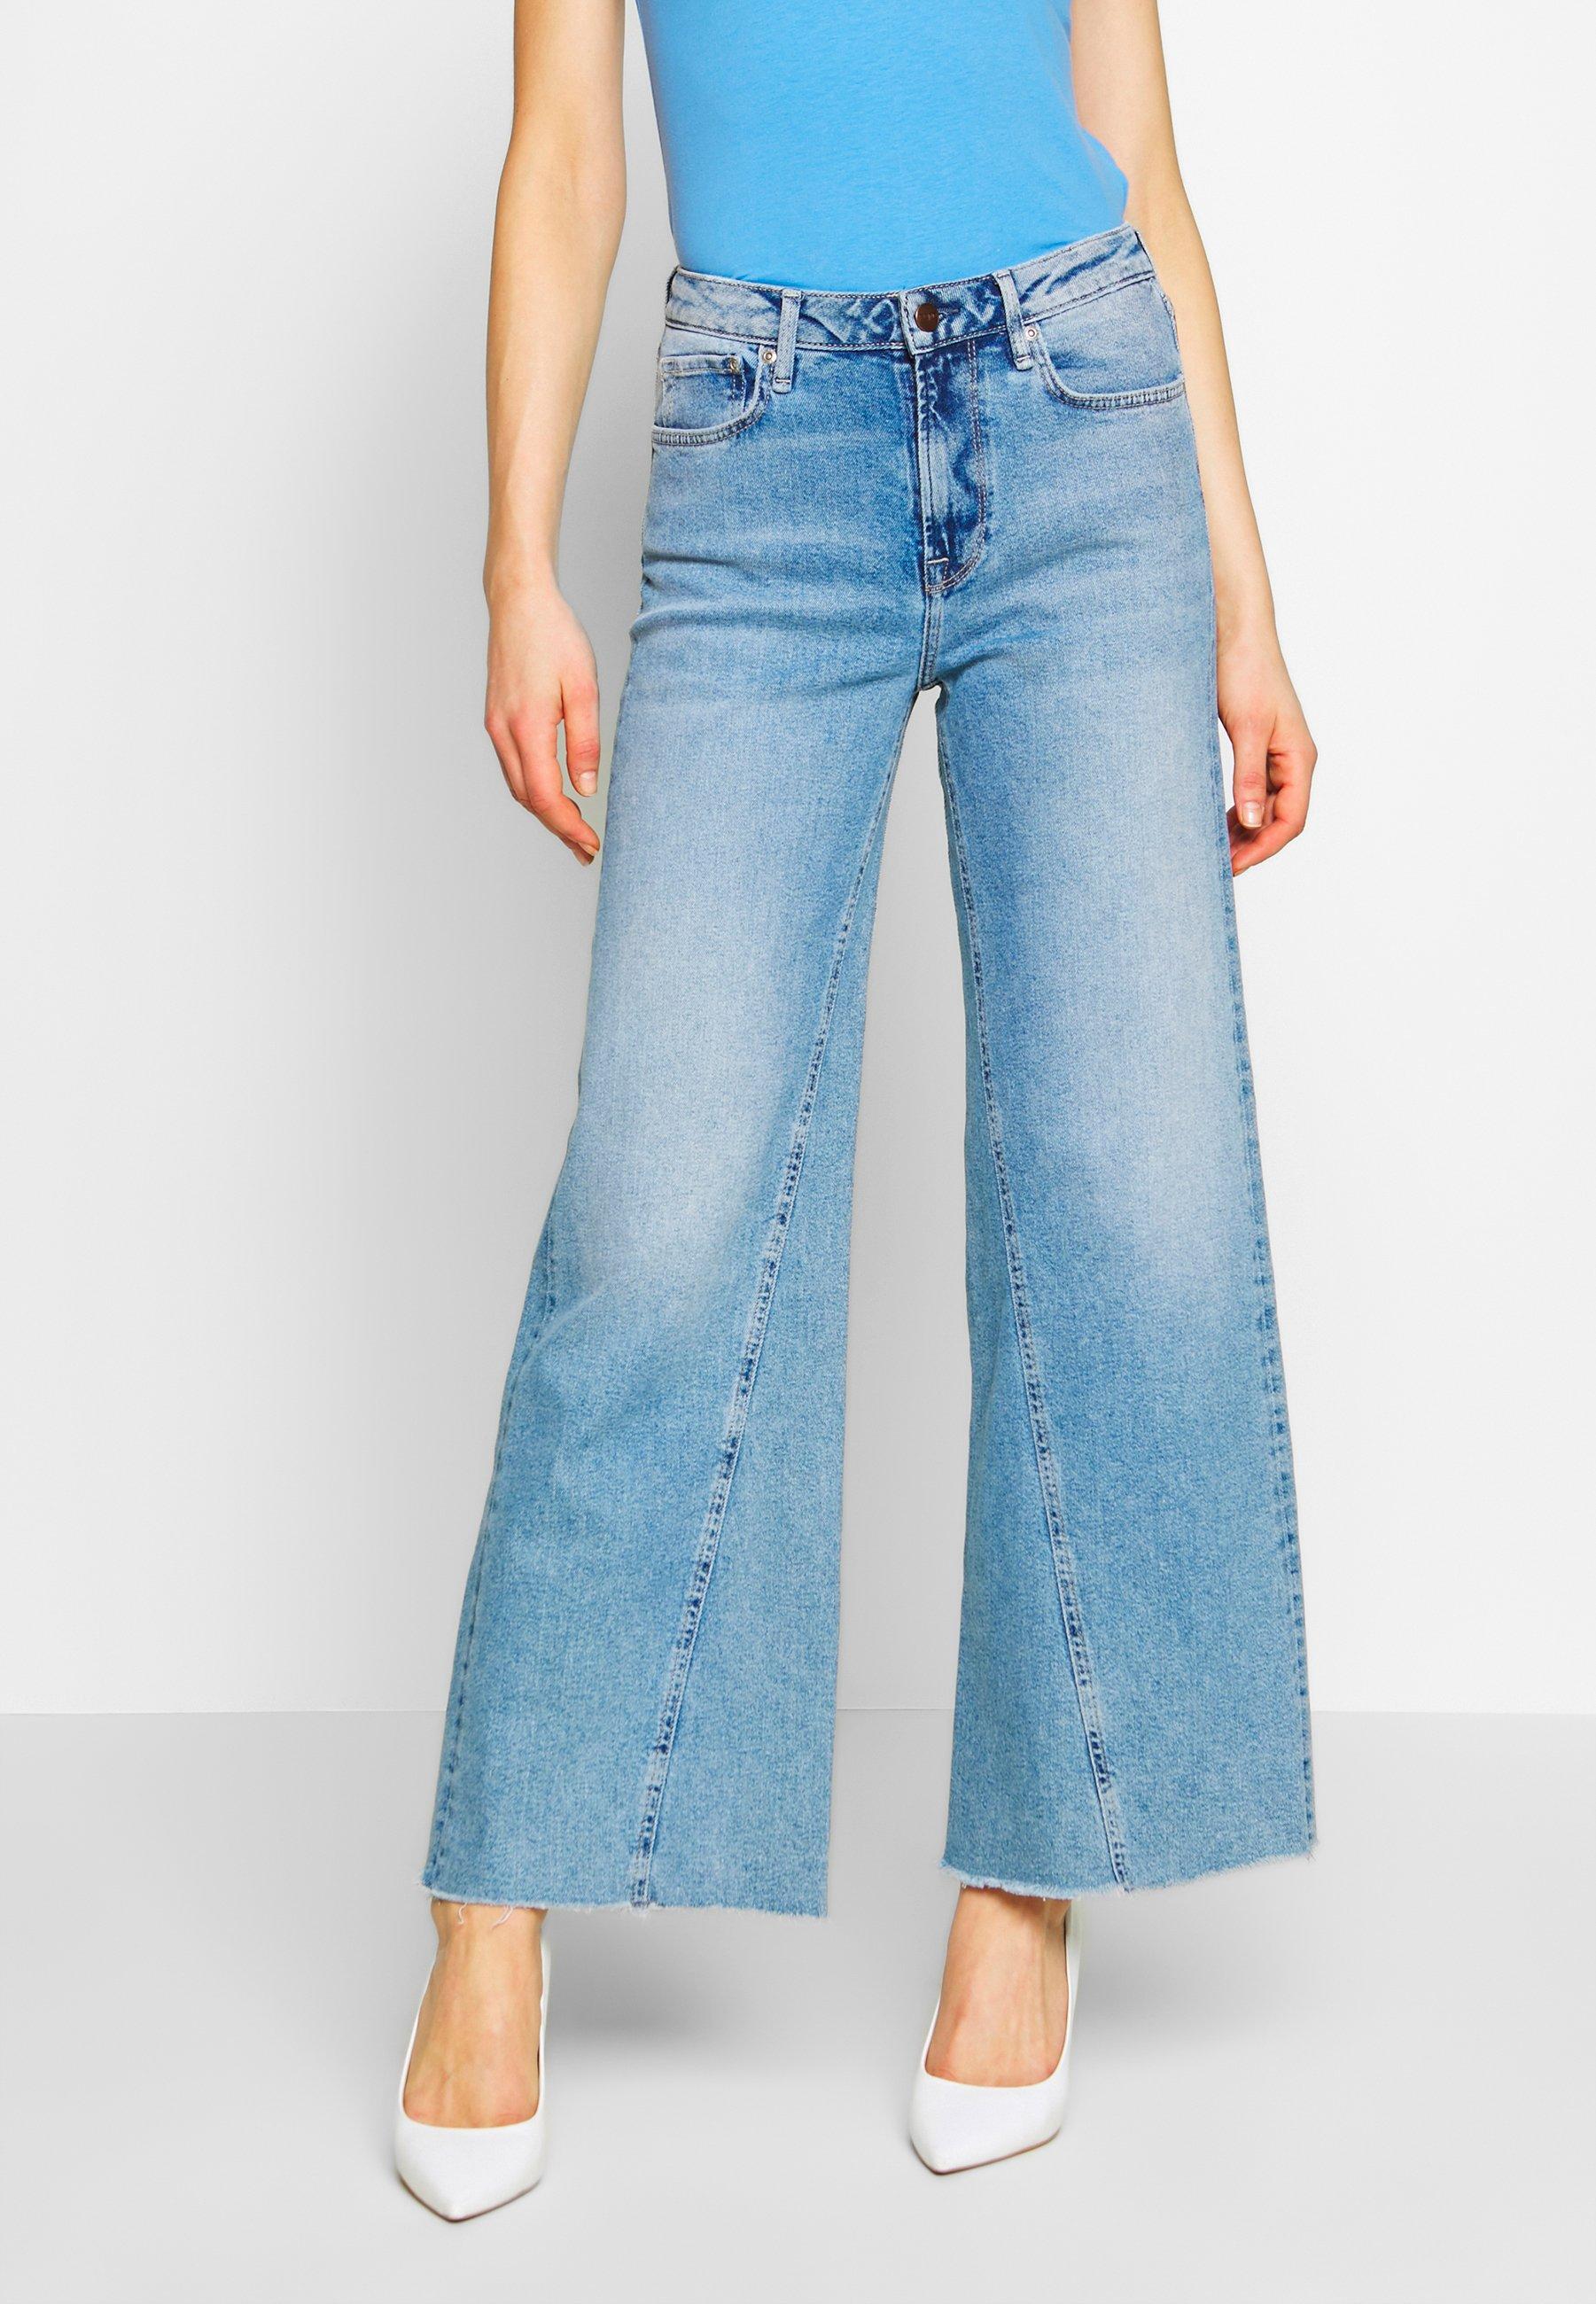 Pepe Jeans HAILEY - Jean flare - denim - Jeans Femme ahx6D